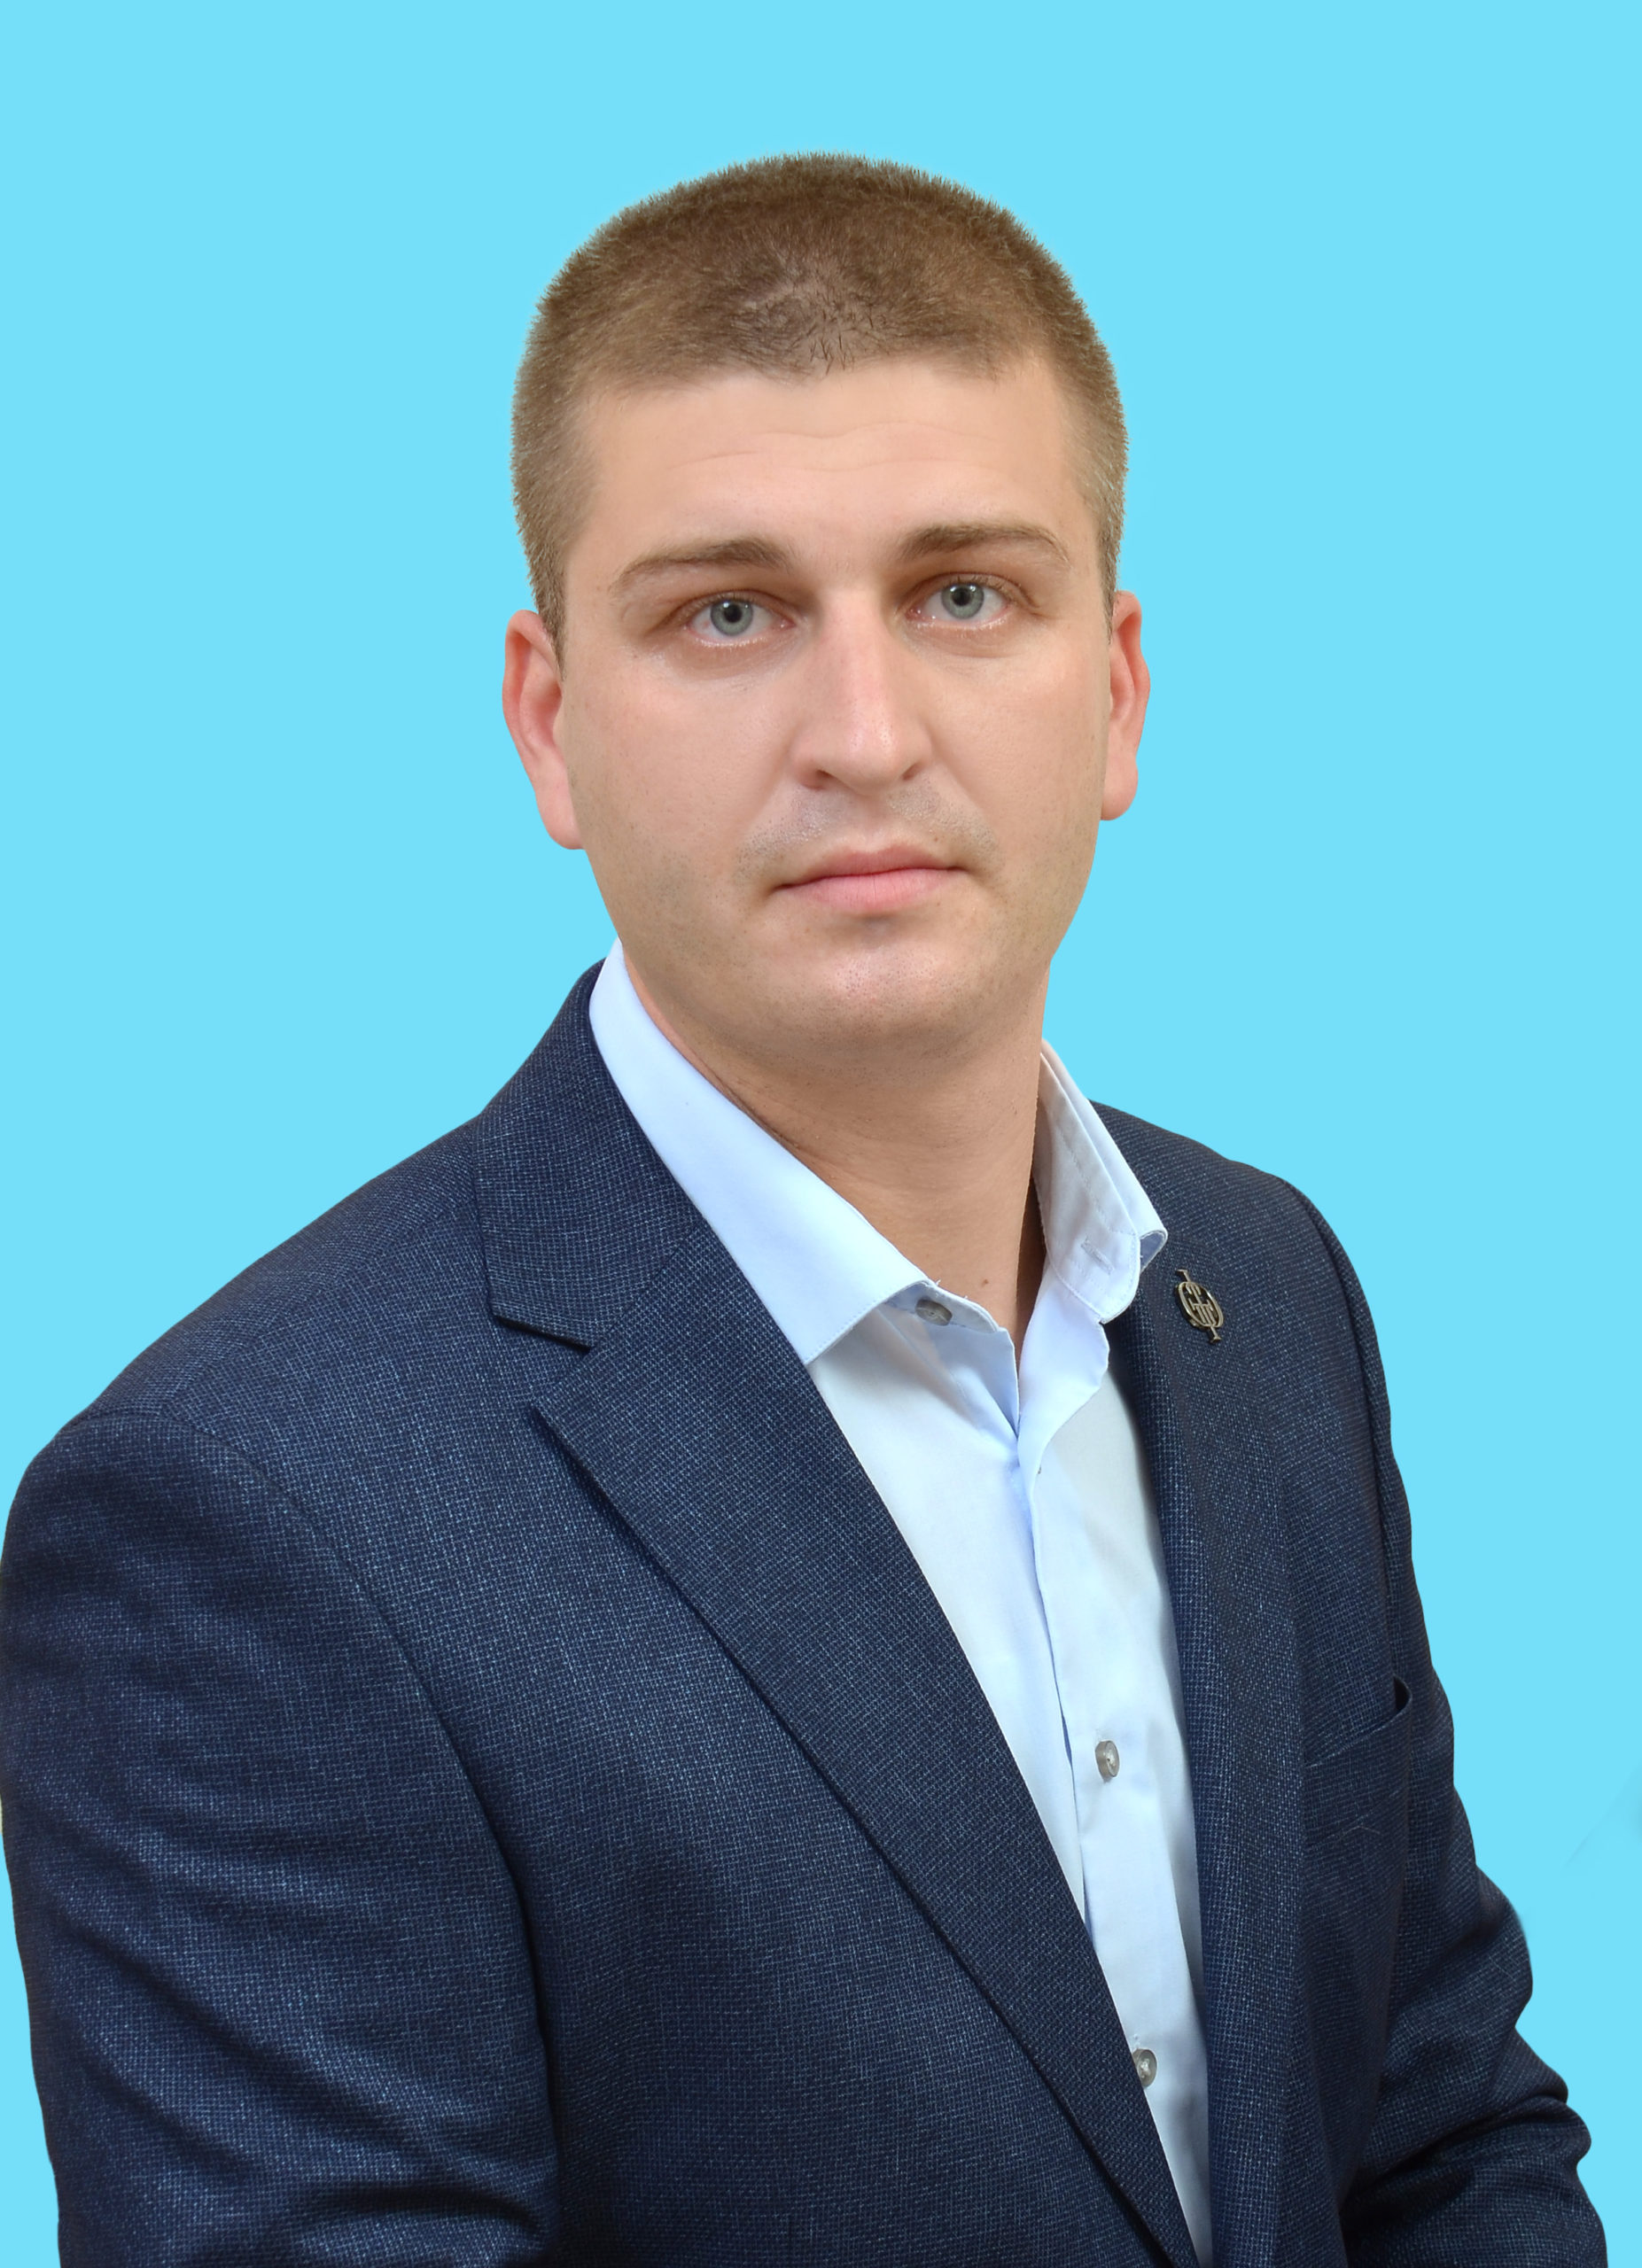 Клочков Кирилл Сергеевич